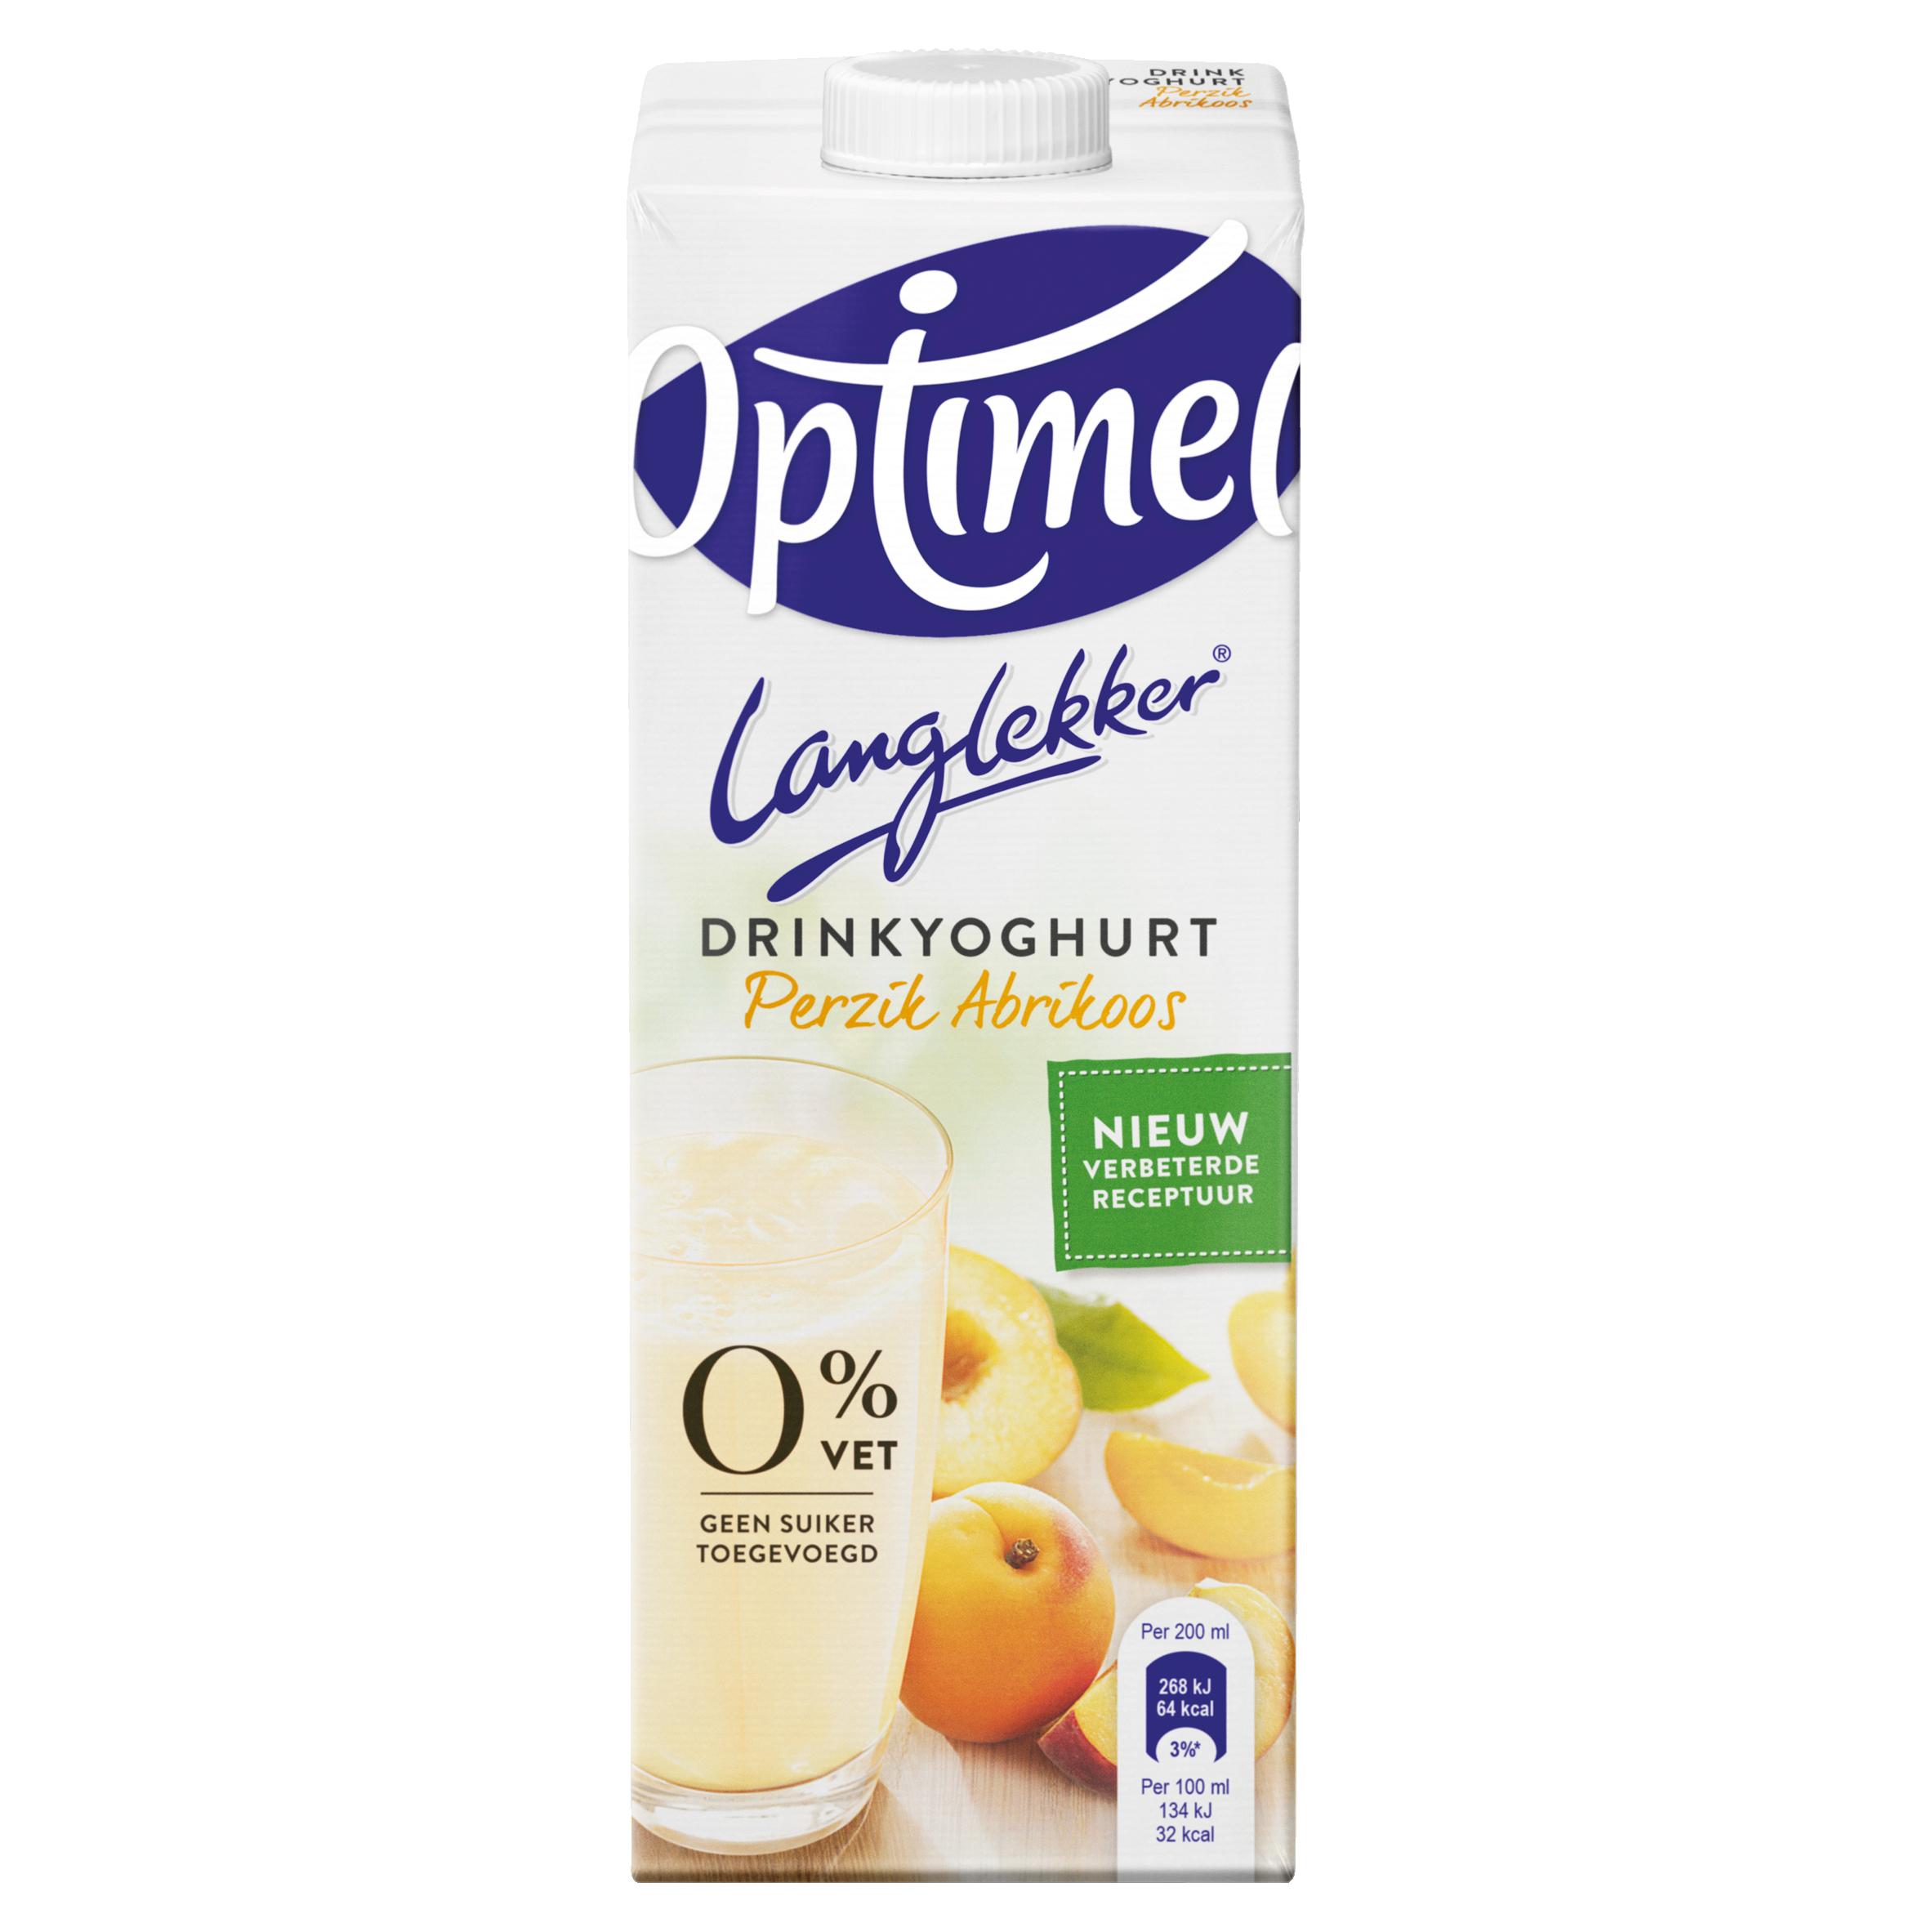 Optimel Langlekker Drinkyoghurt Perzik Abrikoos 1 L